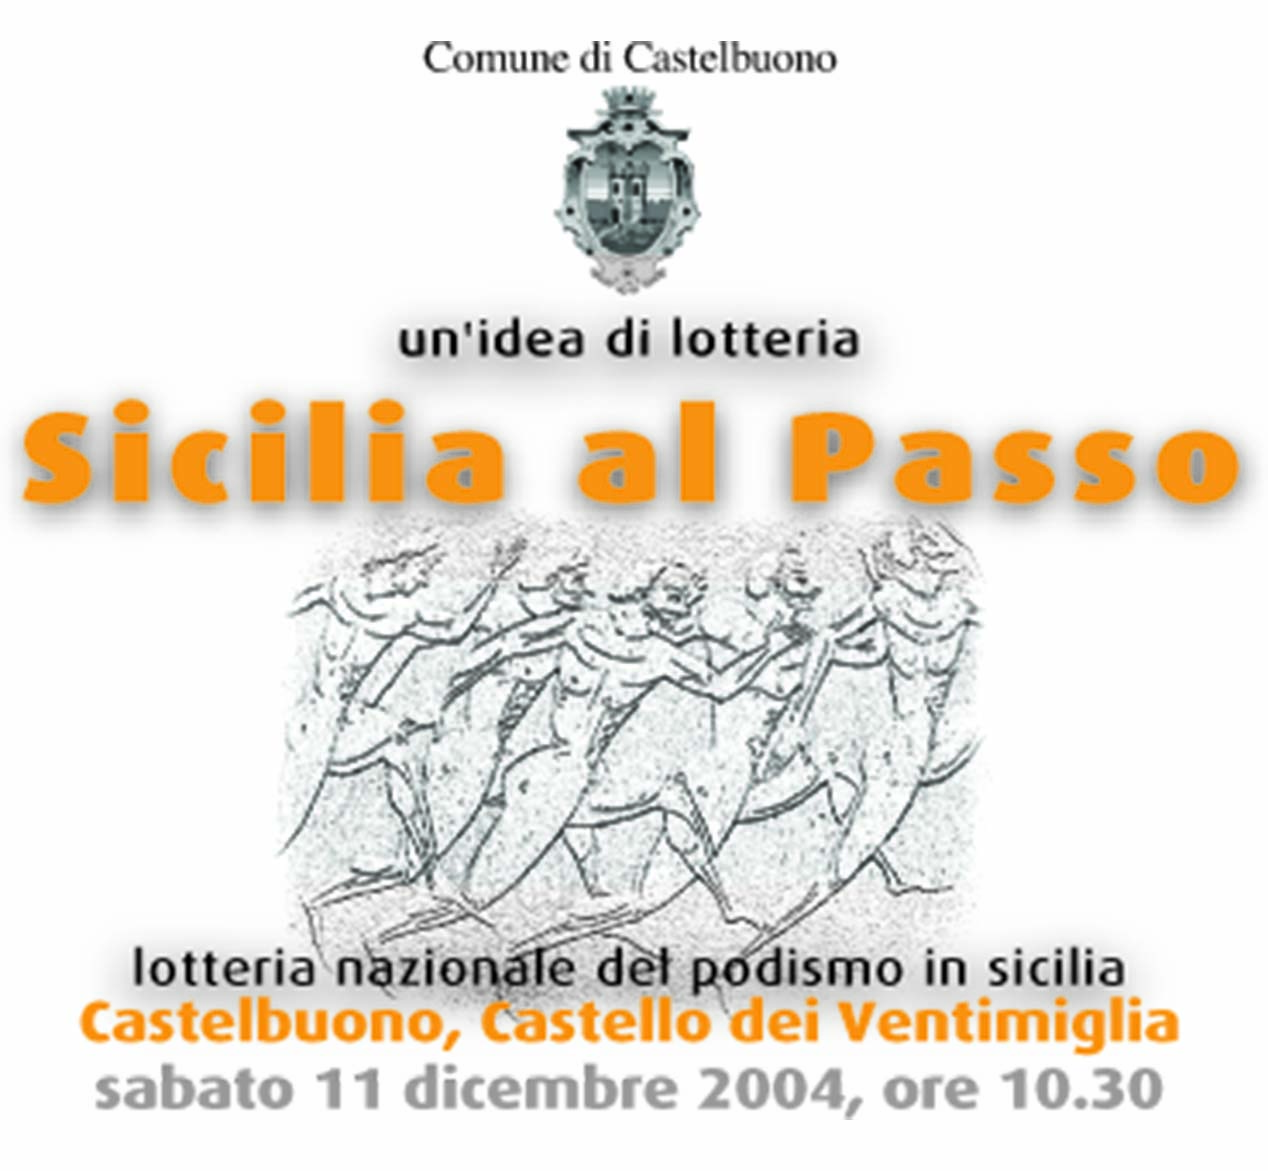 http://www.fondazionesabir.org/wp-content/uploads/2016/11/0_sicilia-al-passo_immag.jpg